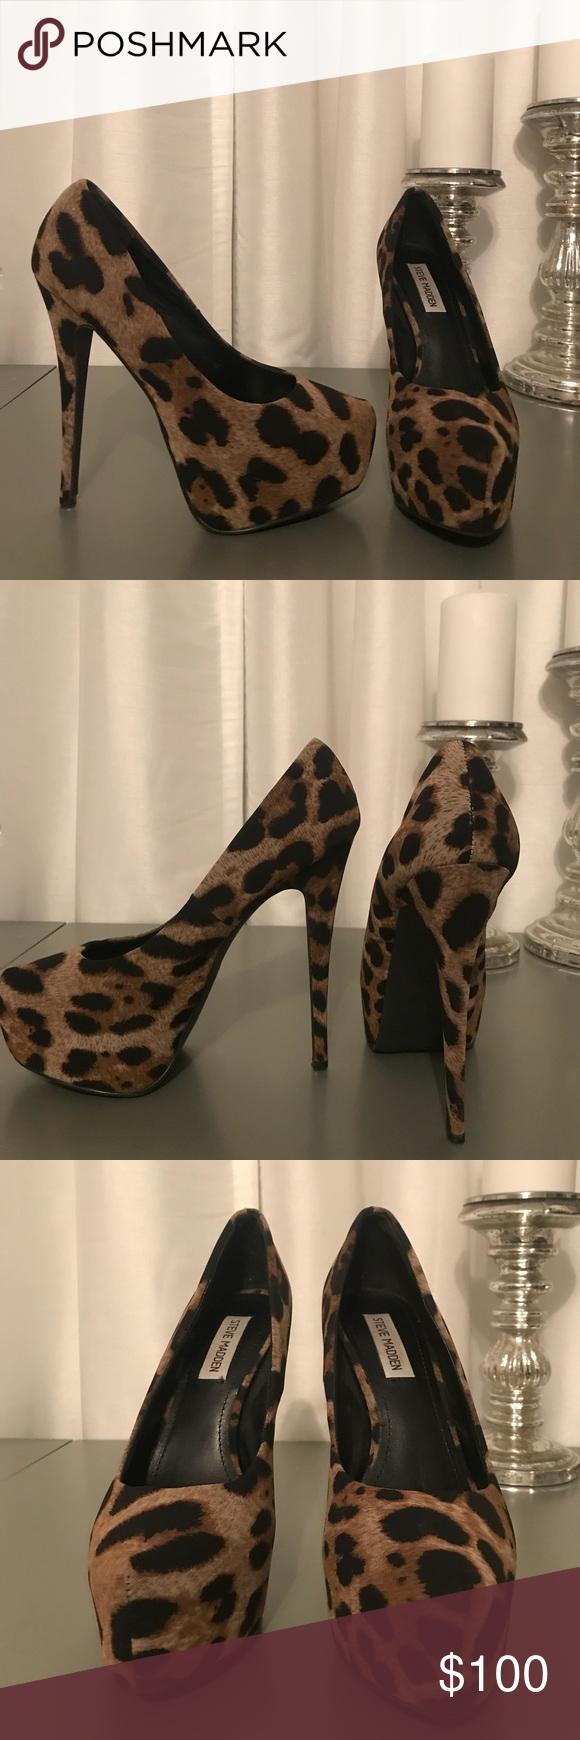 Steve Madden cheetah heels. Cheetah HeelsPlatformsMadden ShoesSteve Madden